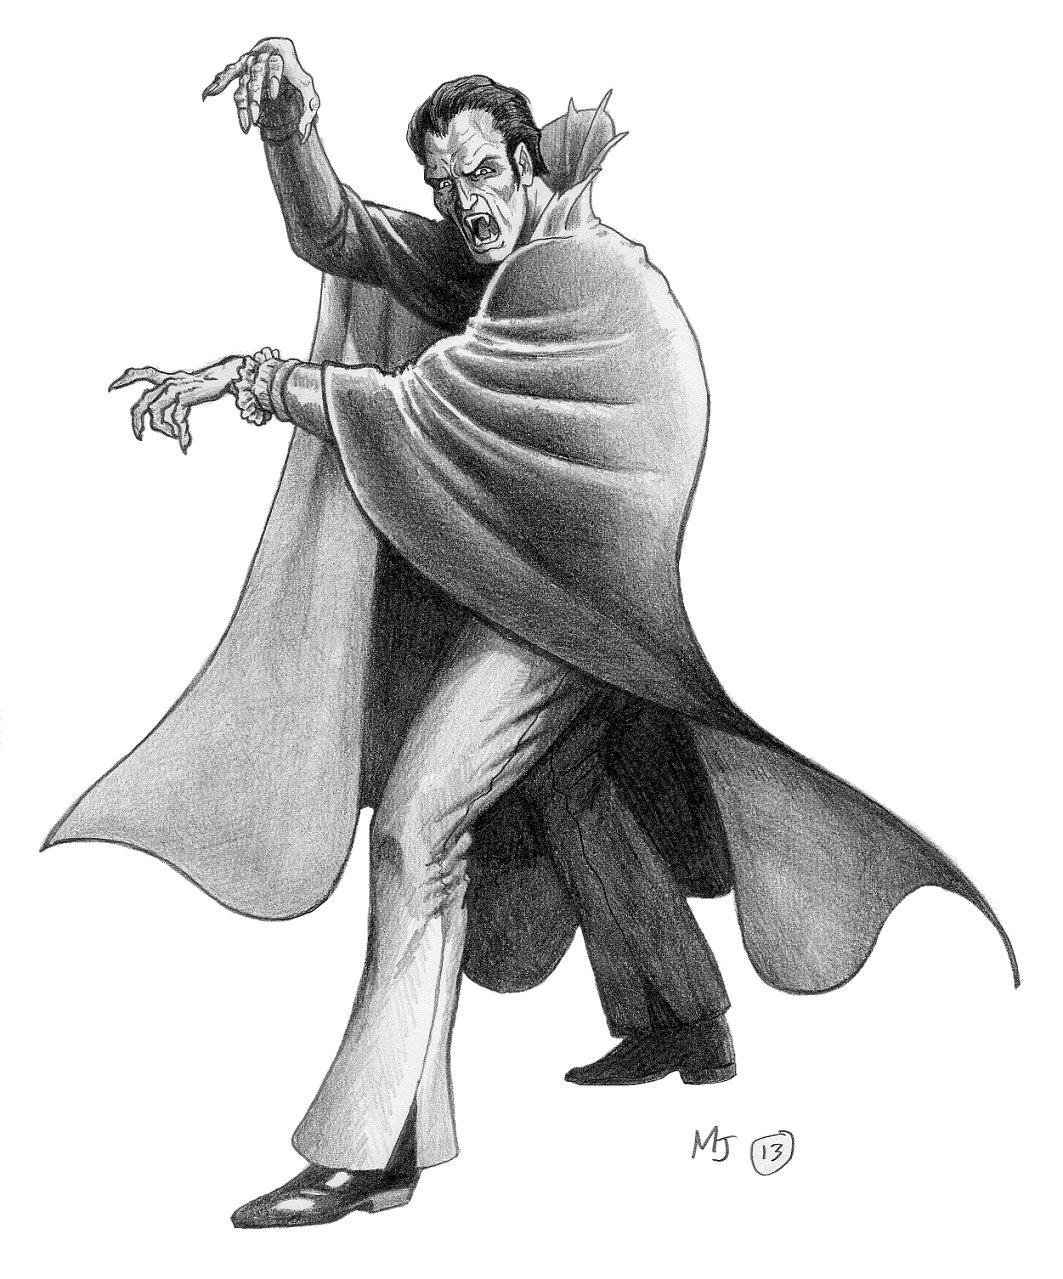 Vorzan the Pseudo-Vampire by mjarrett1000